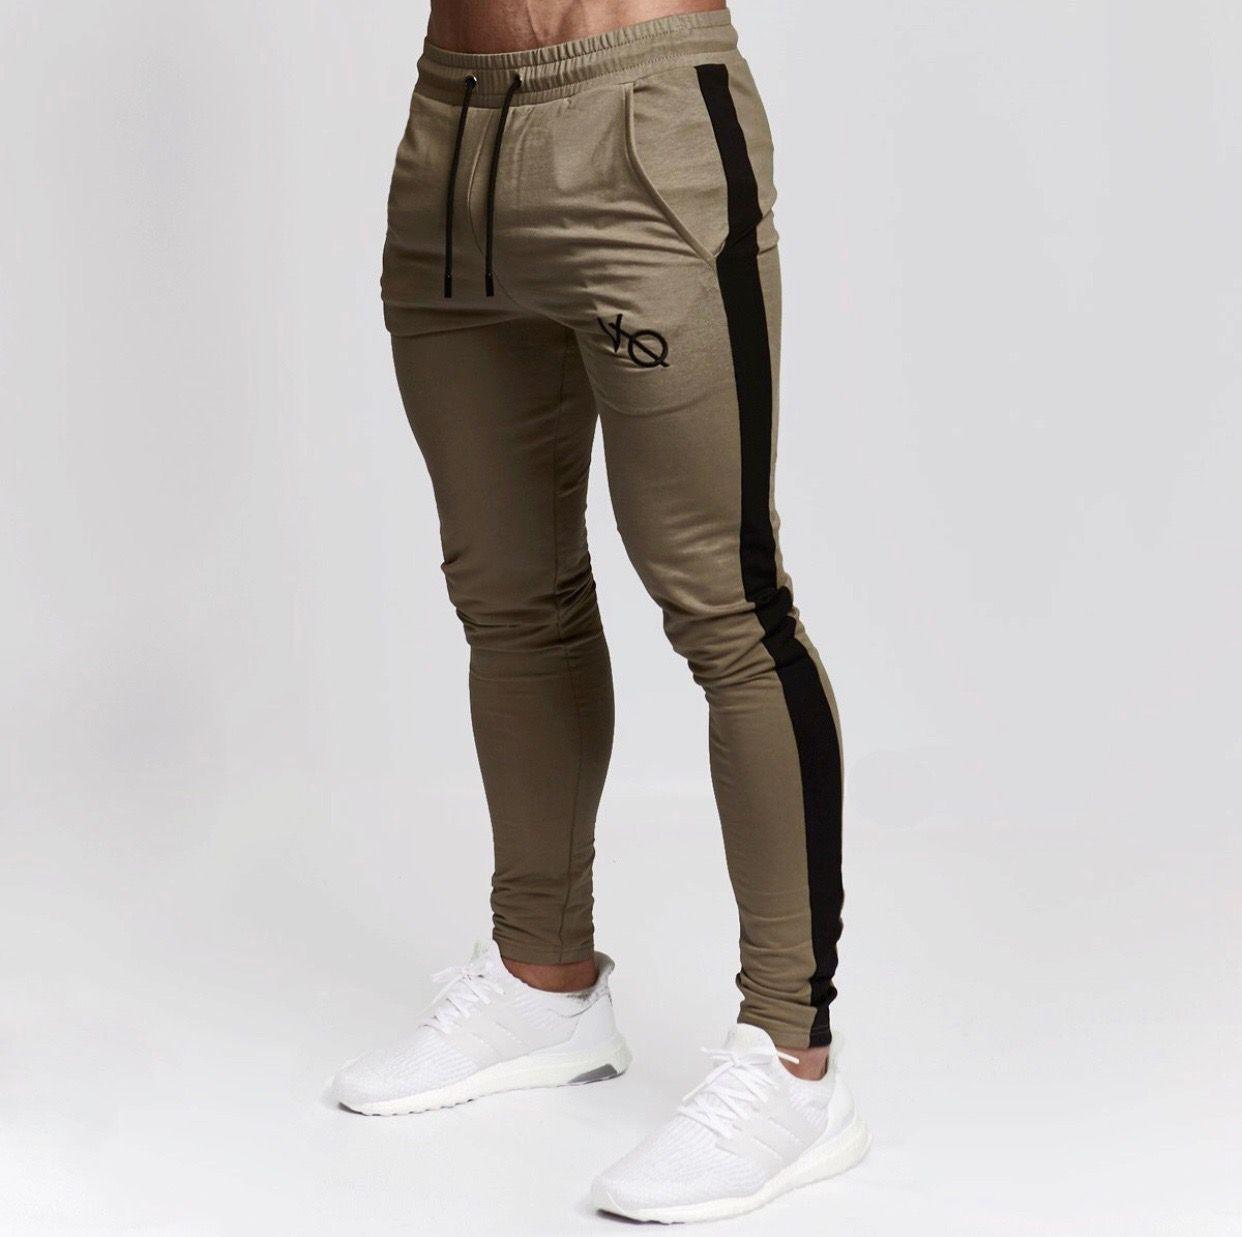 Vanquish Fitness Ropa Gym Hombre Moda Ropa Hombre Pantalones De Chandal